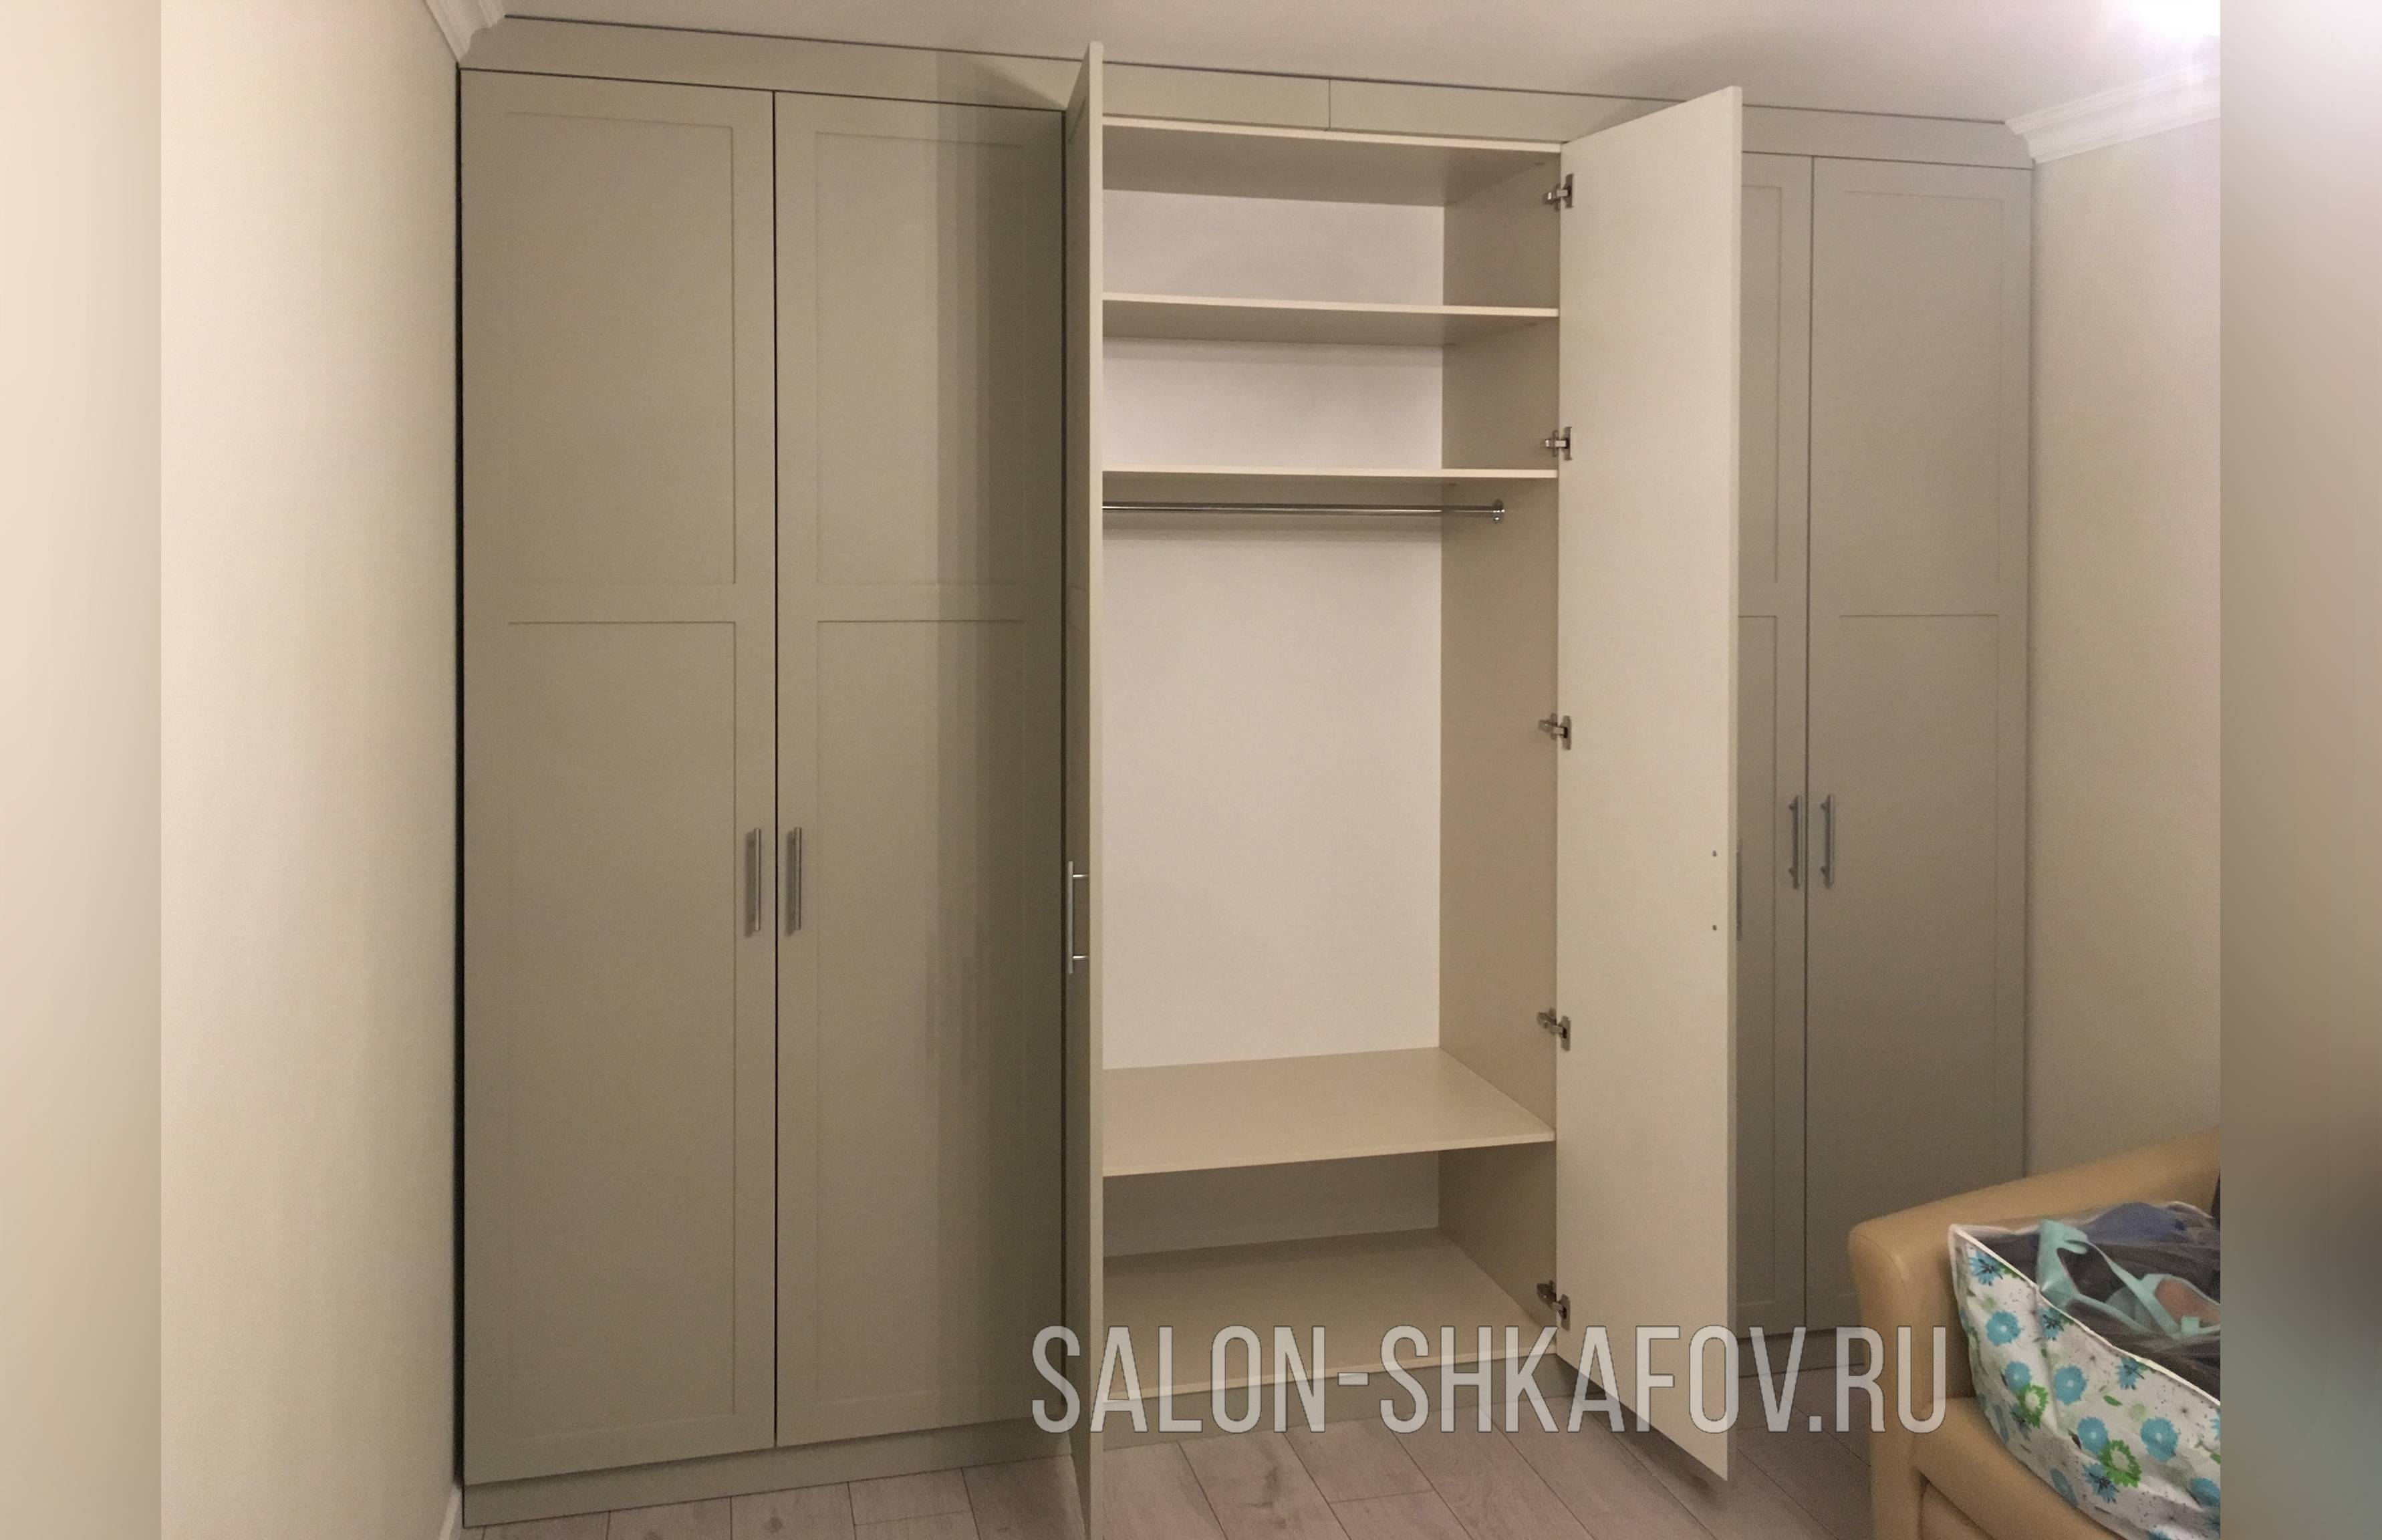 Глянцевые шкафы, их плюсы и минусы, а также правила ухода